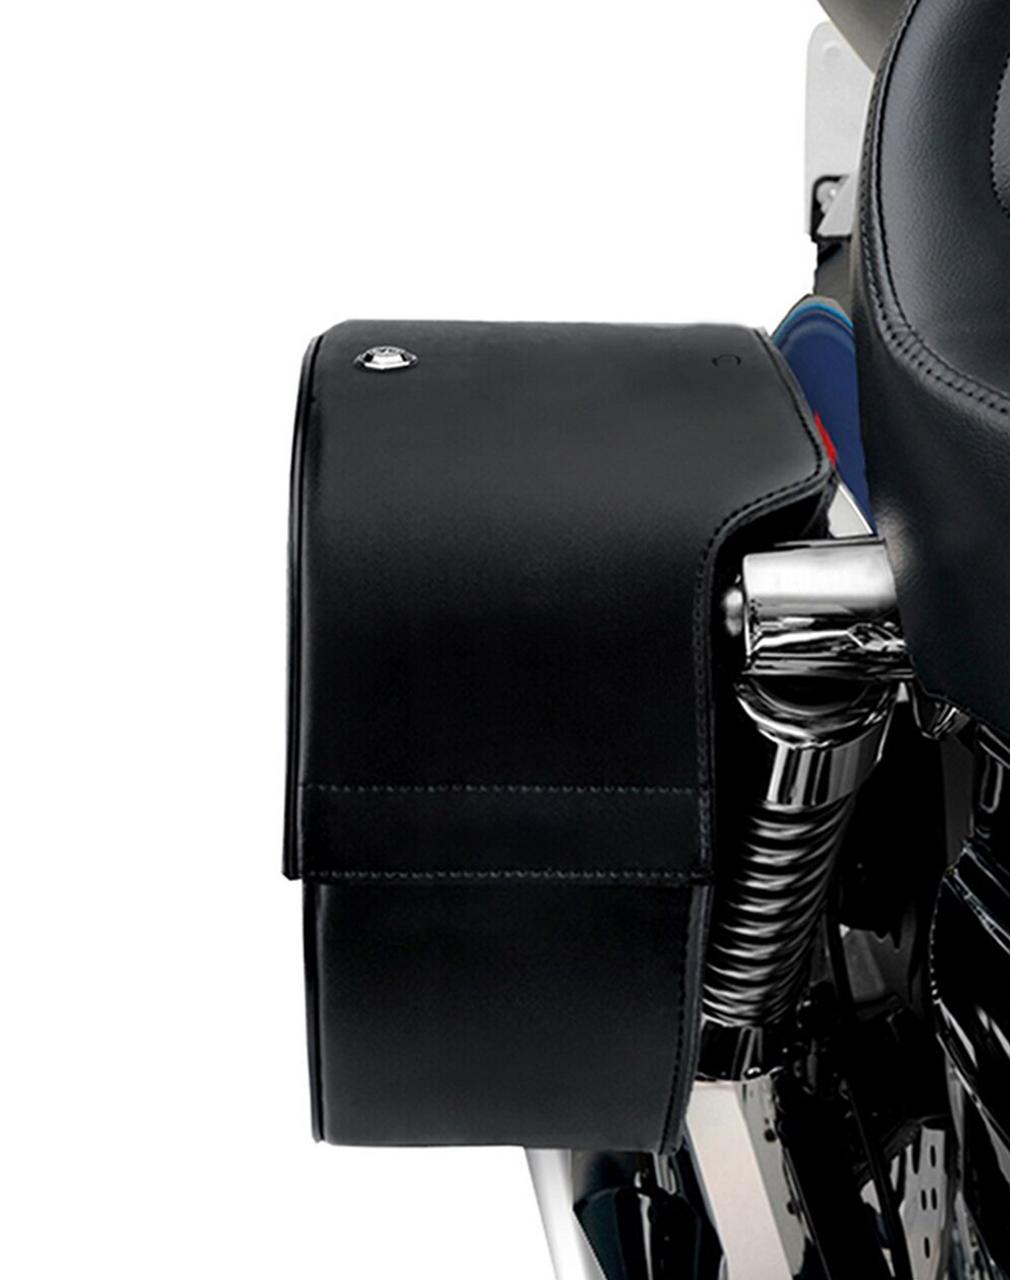 Viking Shock Cut SS Slant Studded Large Motorcycle Saddlebags For Harley Dyna Street Bob FXDB Shock Cutout View